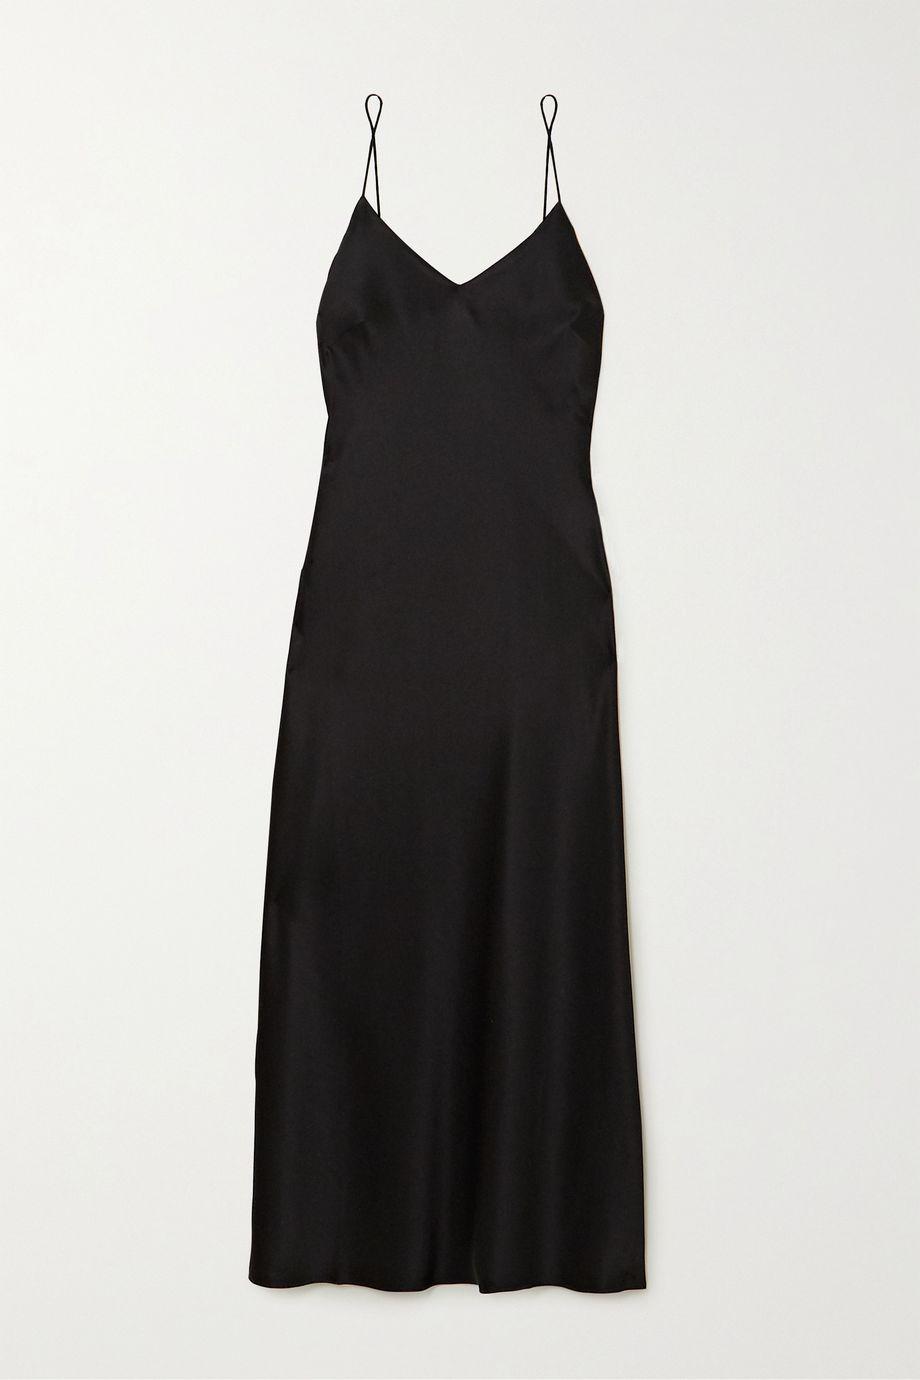 Anine Bing Rosemary silk-charmeuse midi dress